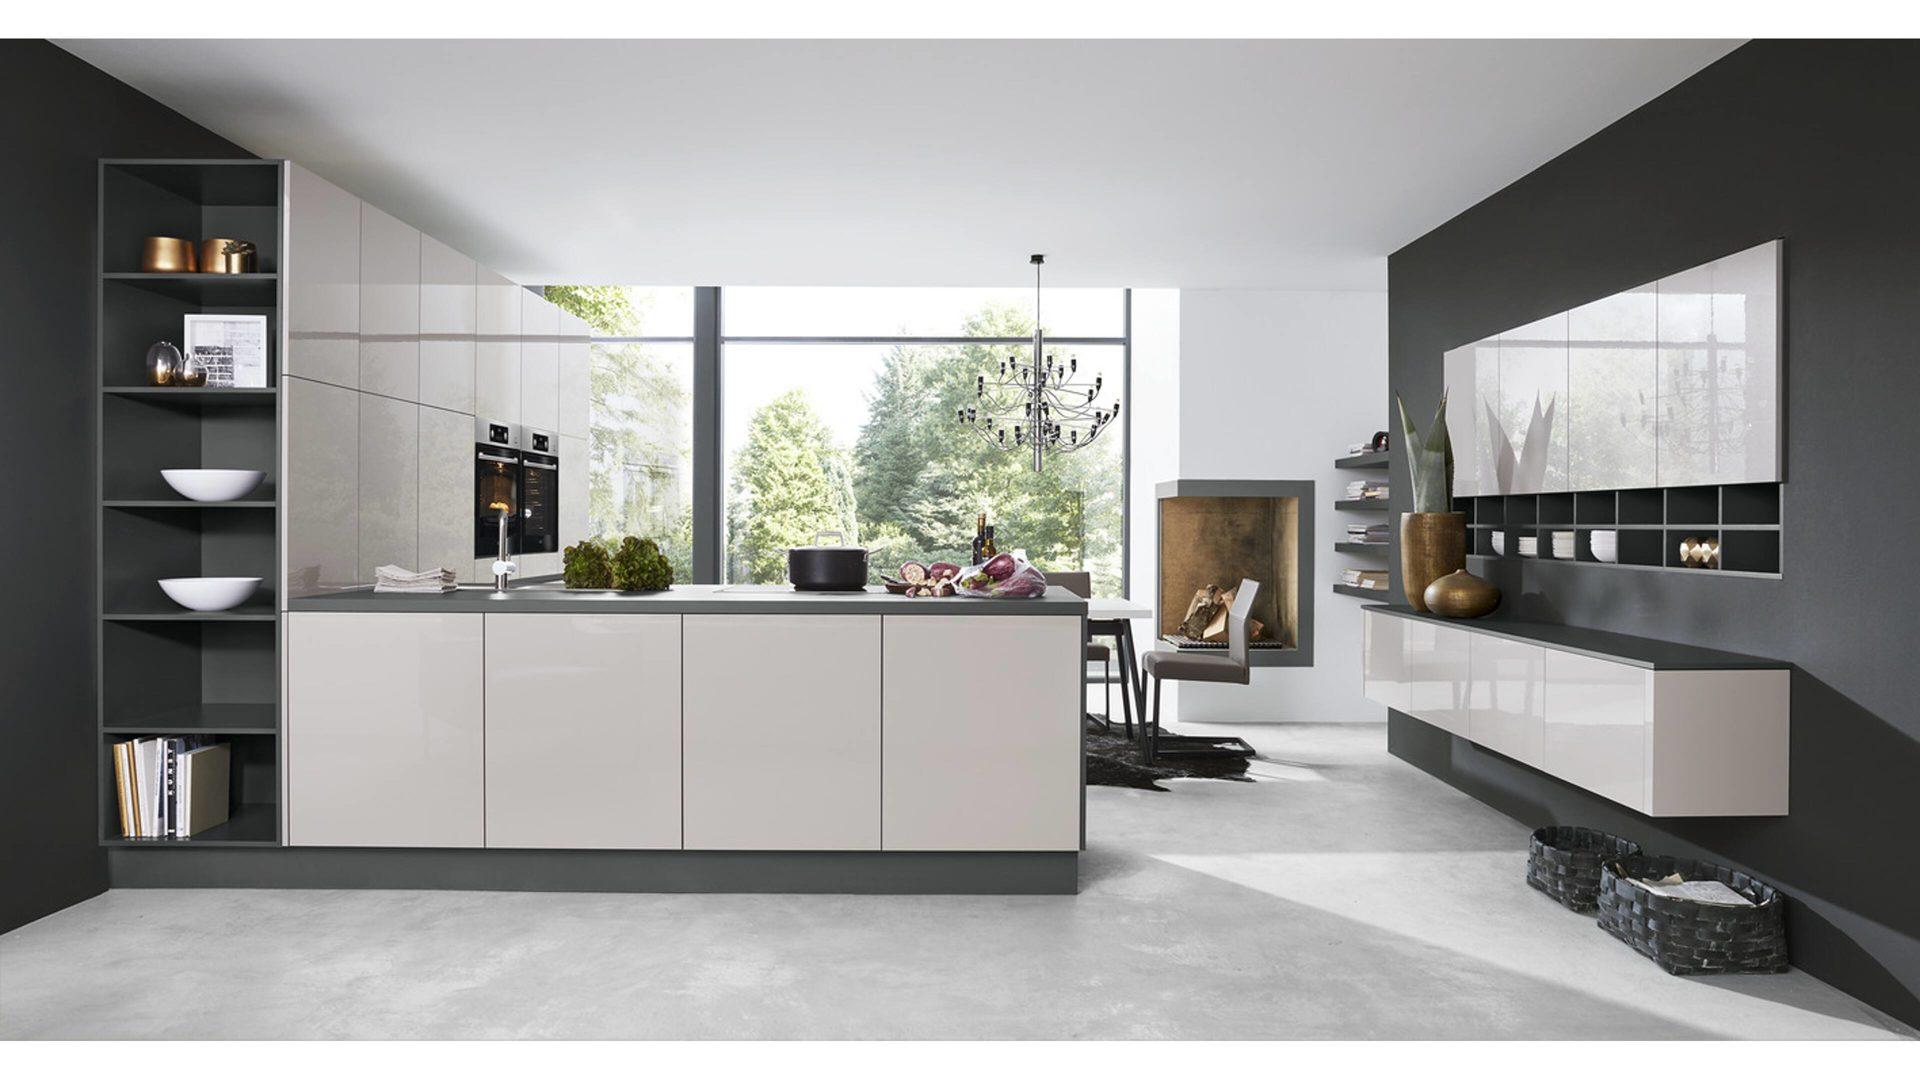 Wunderbar Holz Modus Küchen Ideen - Küche Set Ideen - deriherusweets ...